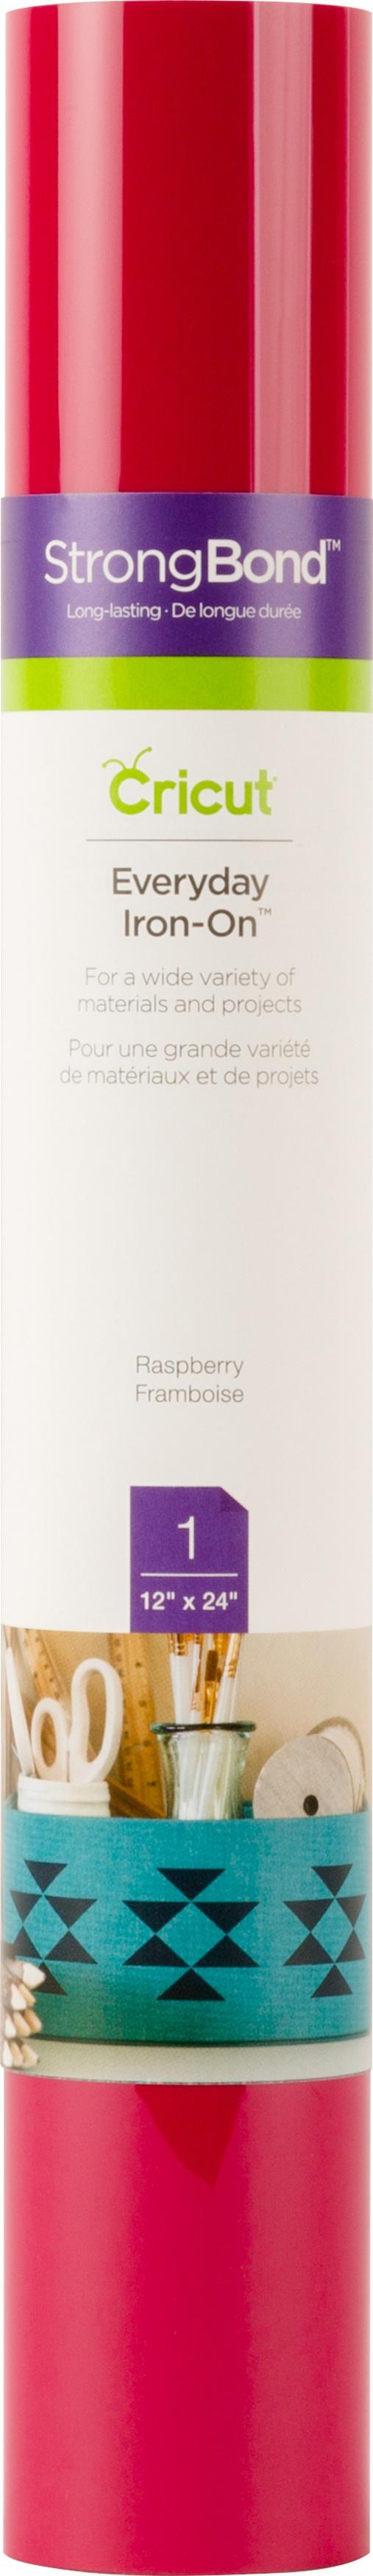 Cricut Everyday Iron-On Vinyl 12X24 Roll-Raspberry